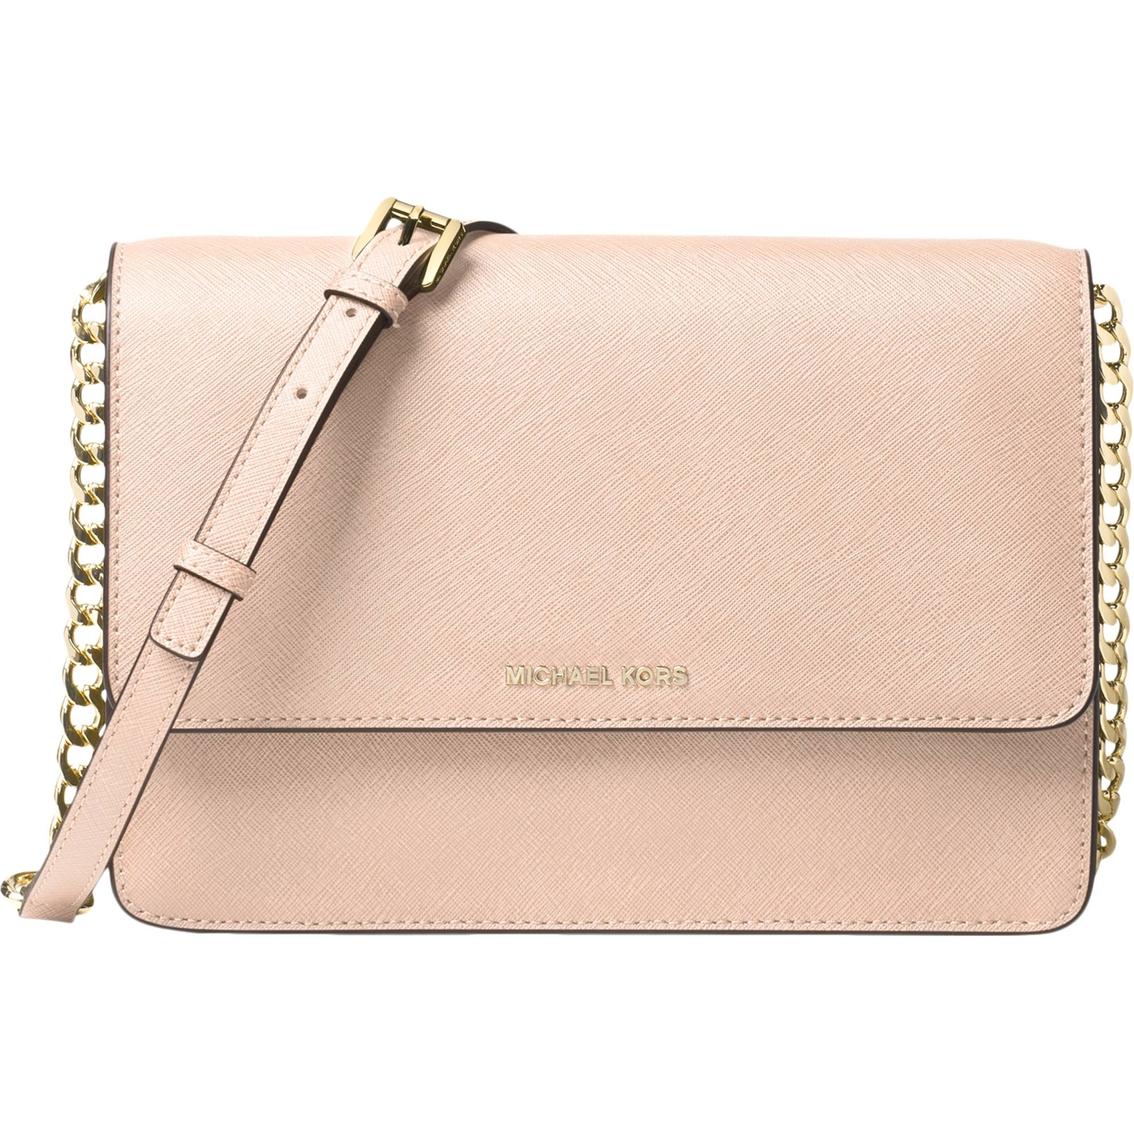 903adc33ed16 Michael Kors Large Gusset Crossbody | Handbags | Shop The Exchange